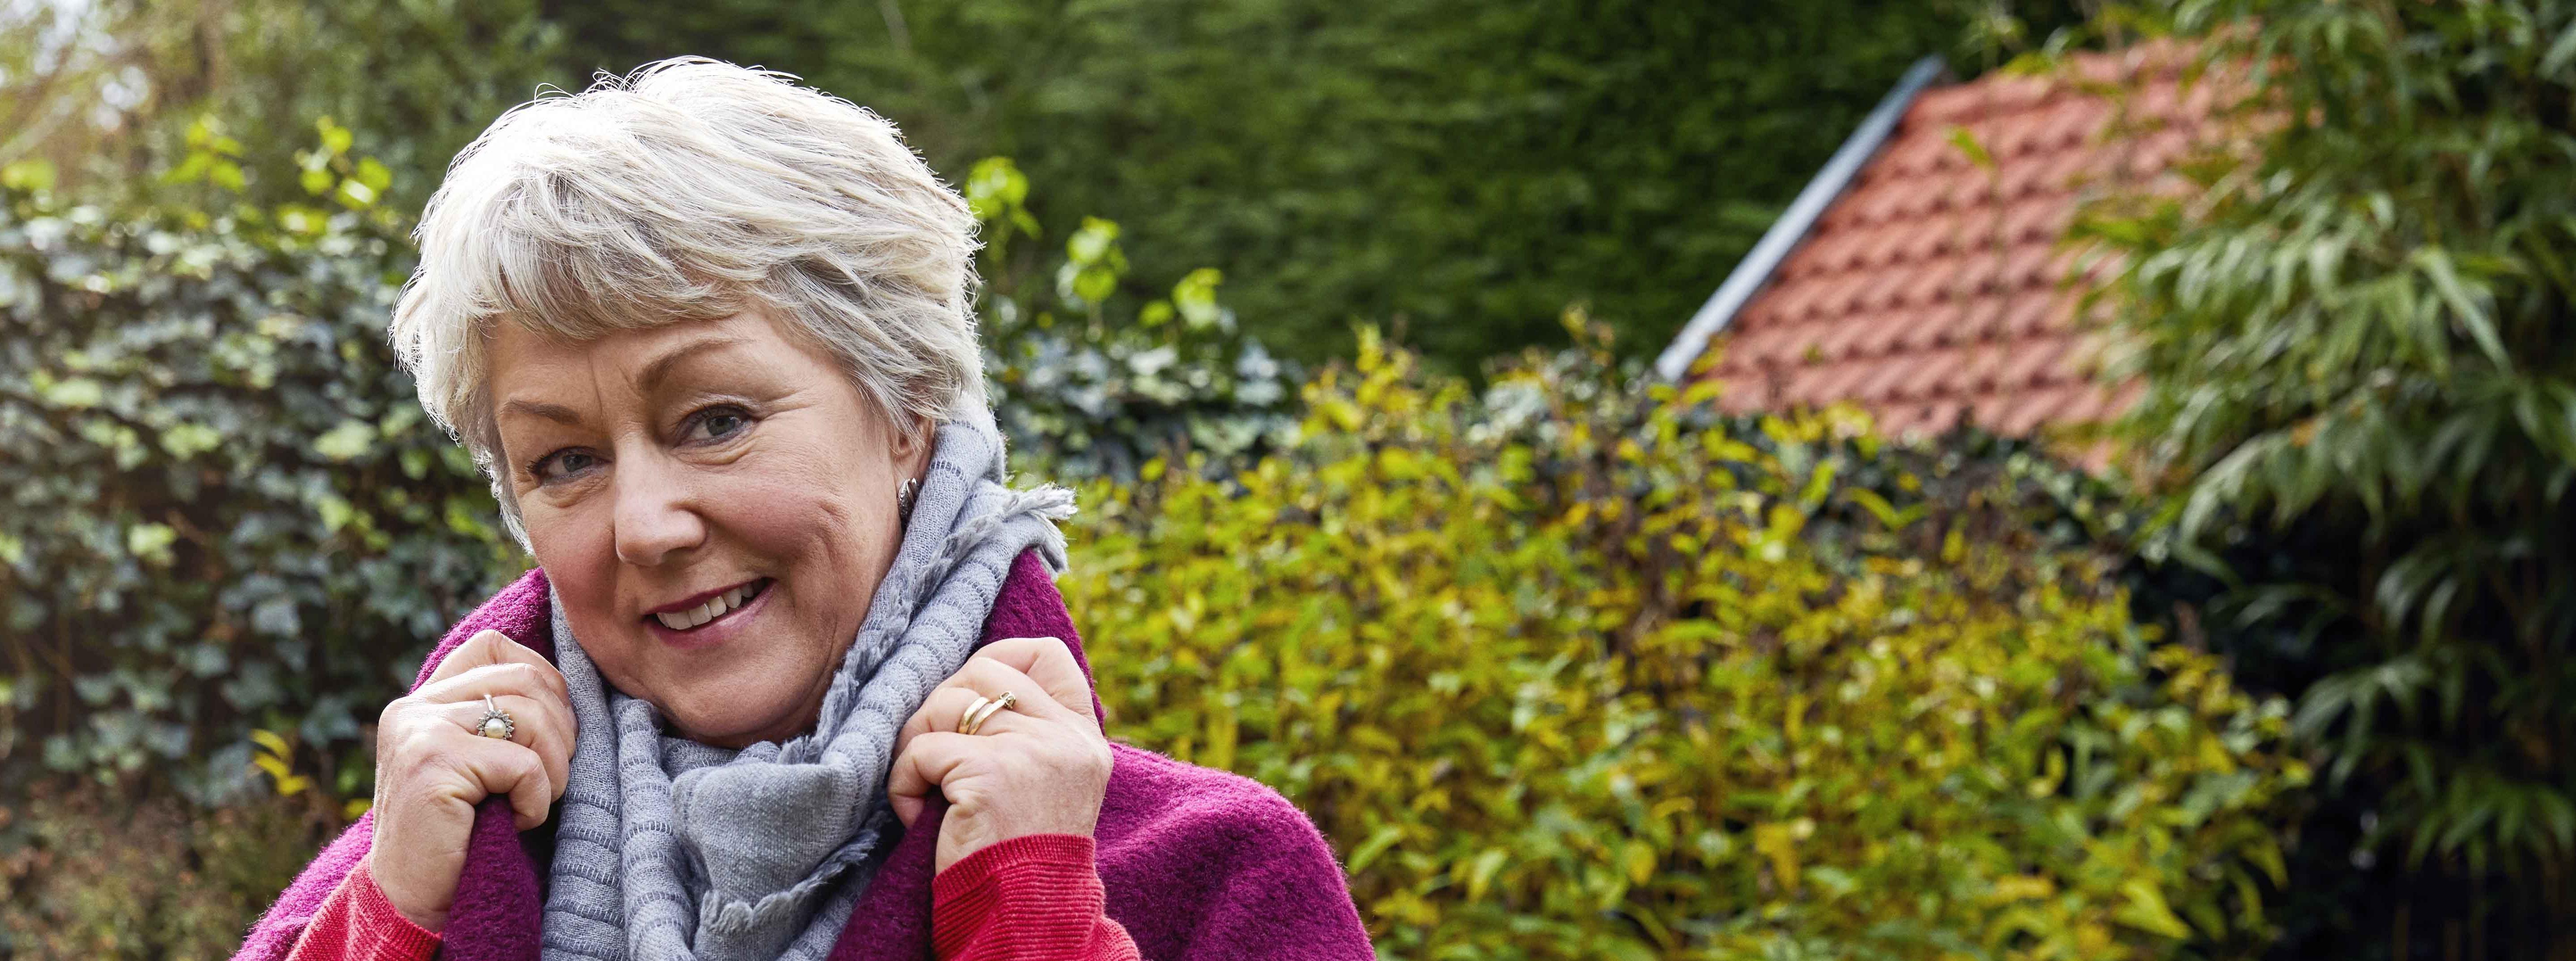 zwangerschap 50 jaar Volwassenen 50+ levensfase: voedingsstoffen | Davitamon zwangerschap 50 jaar